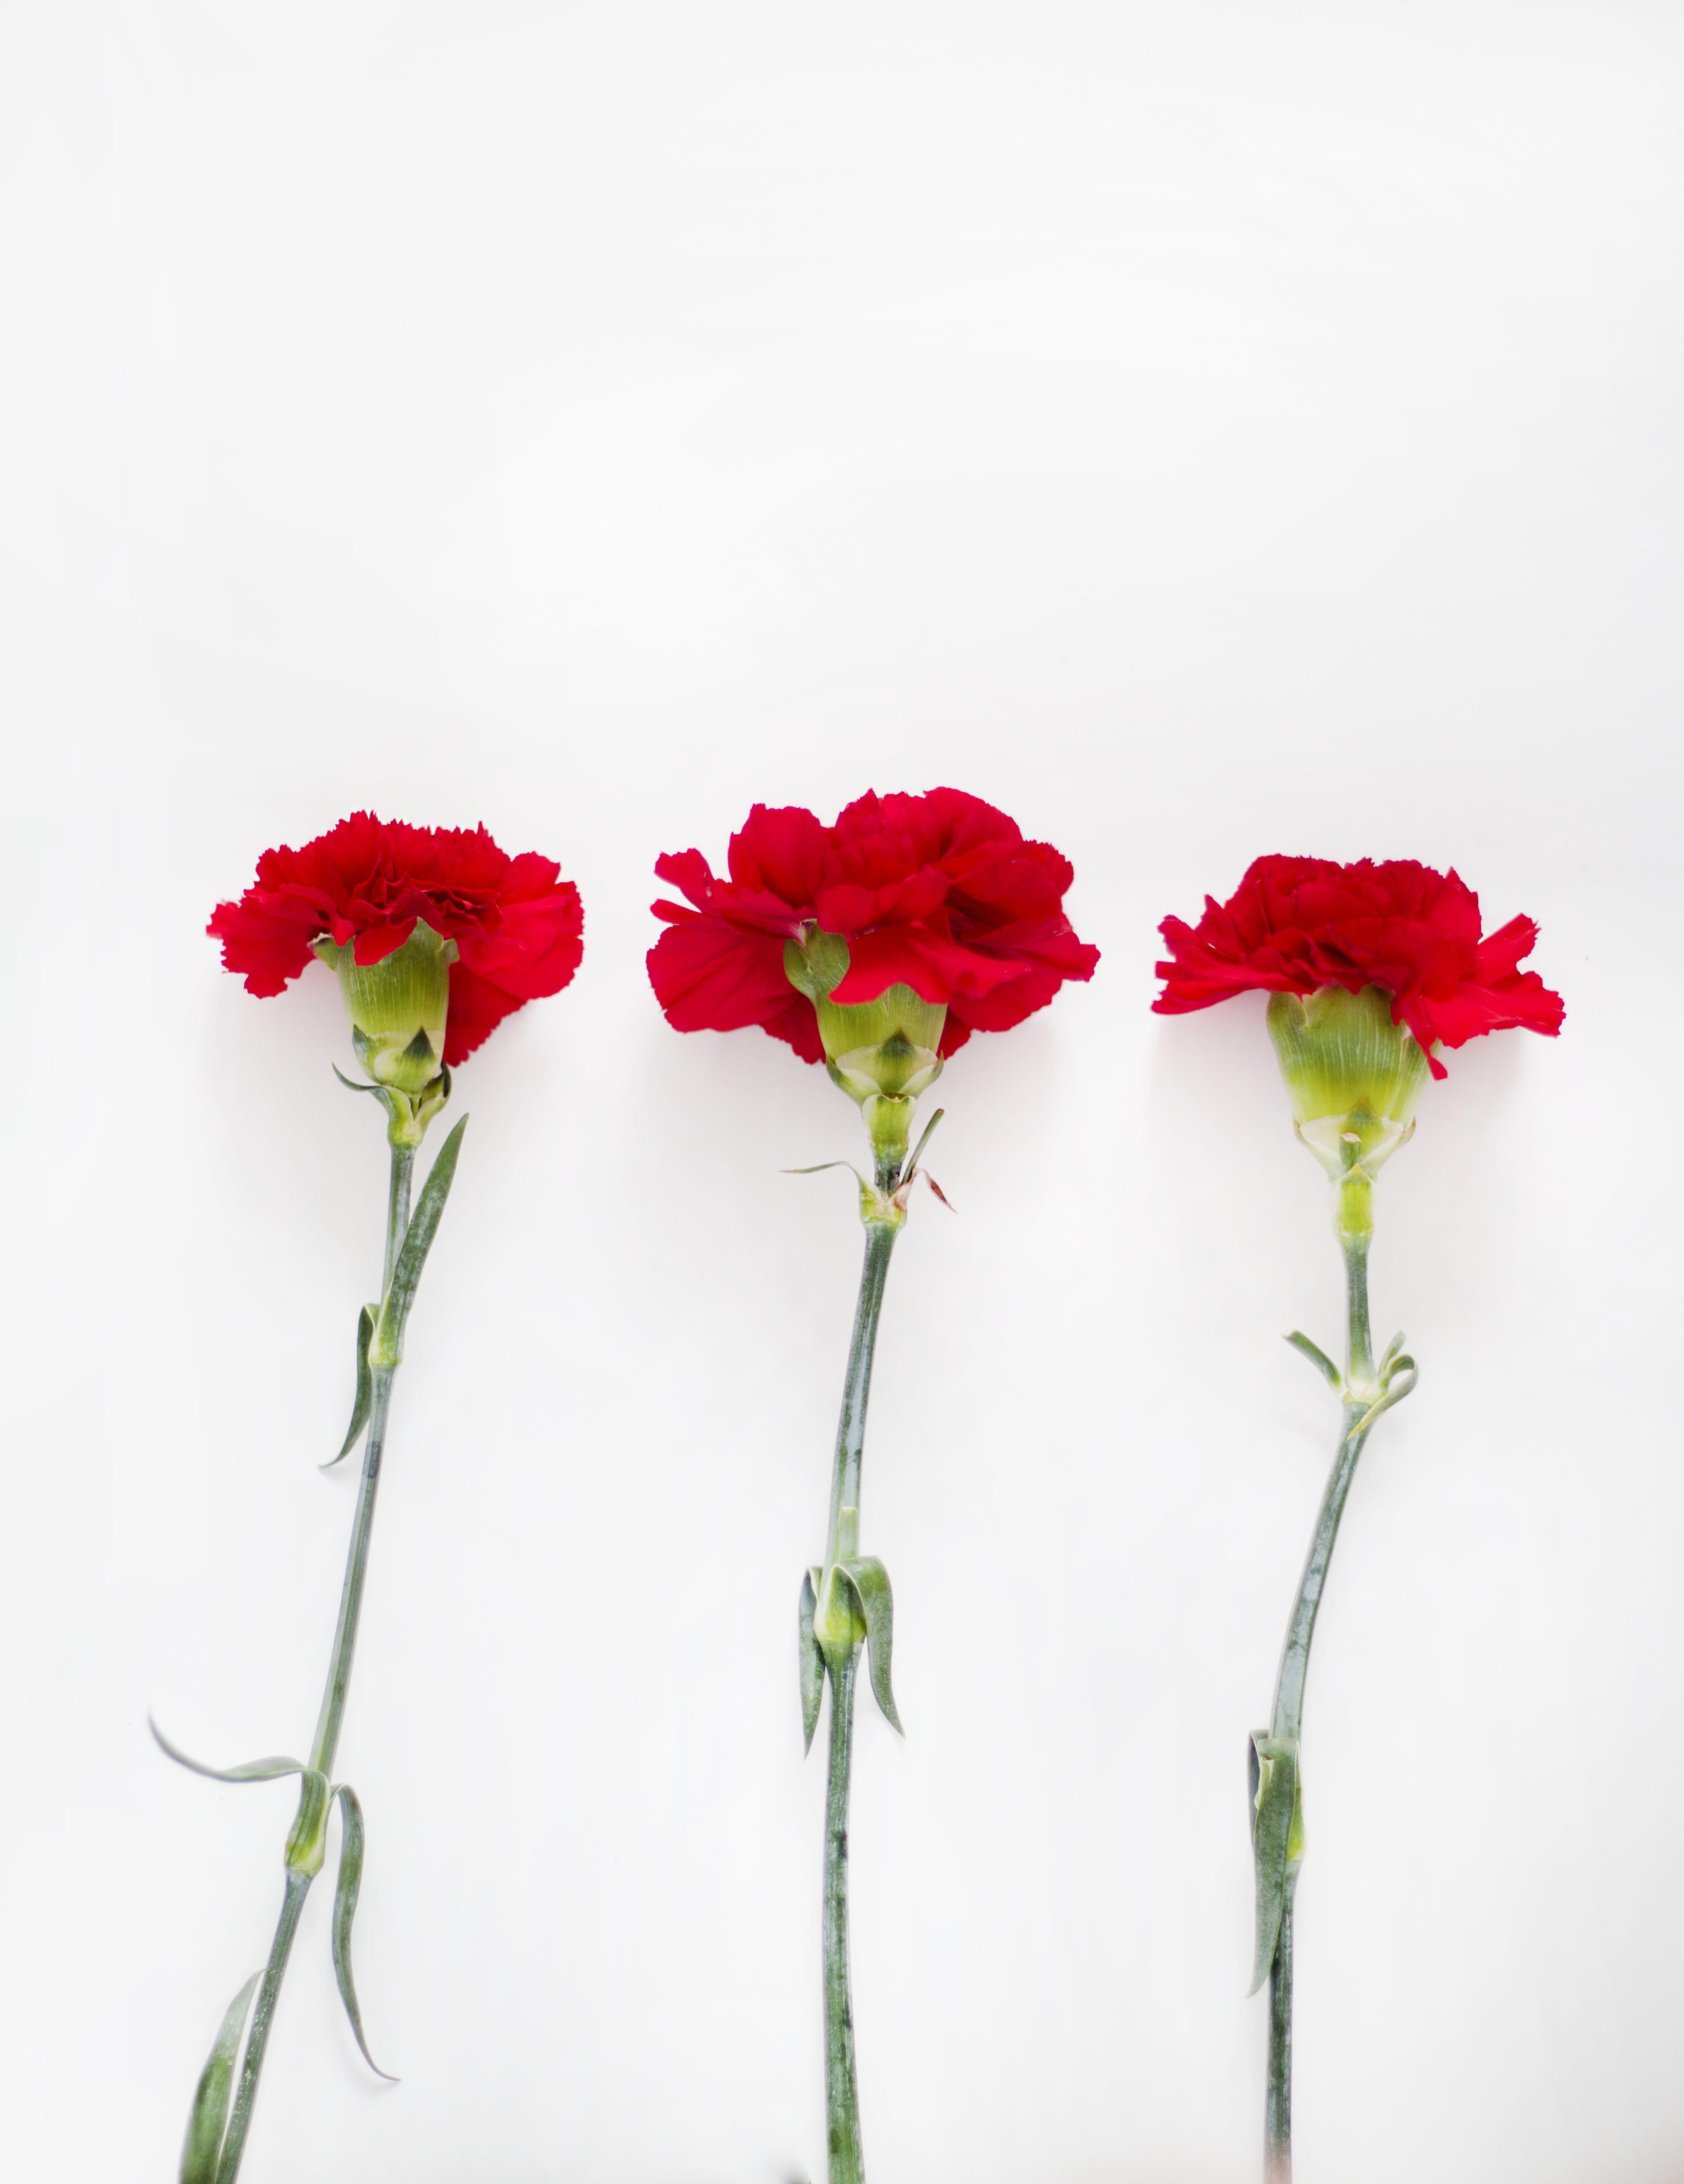 Flatlay Photography of Carnation